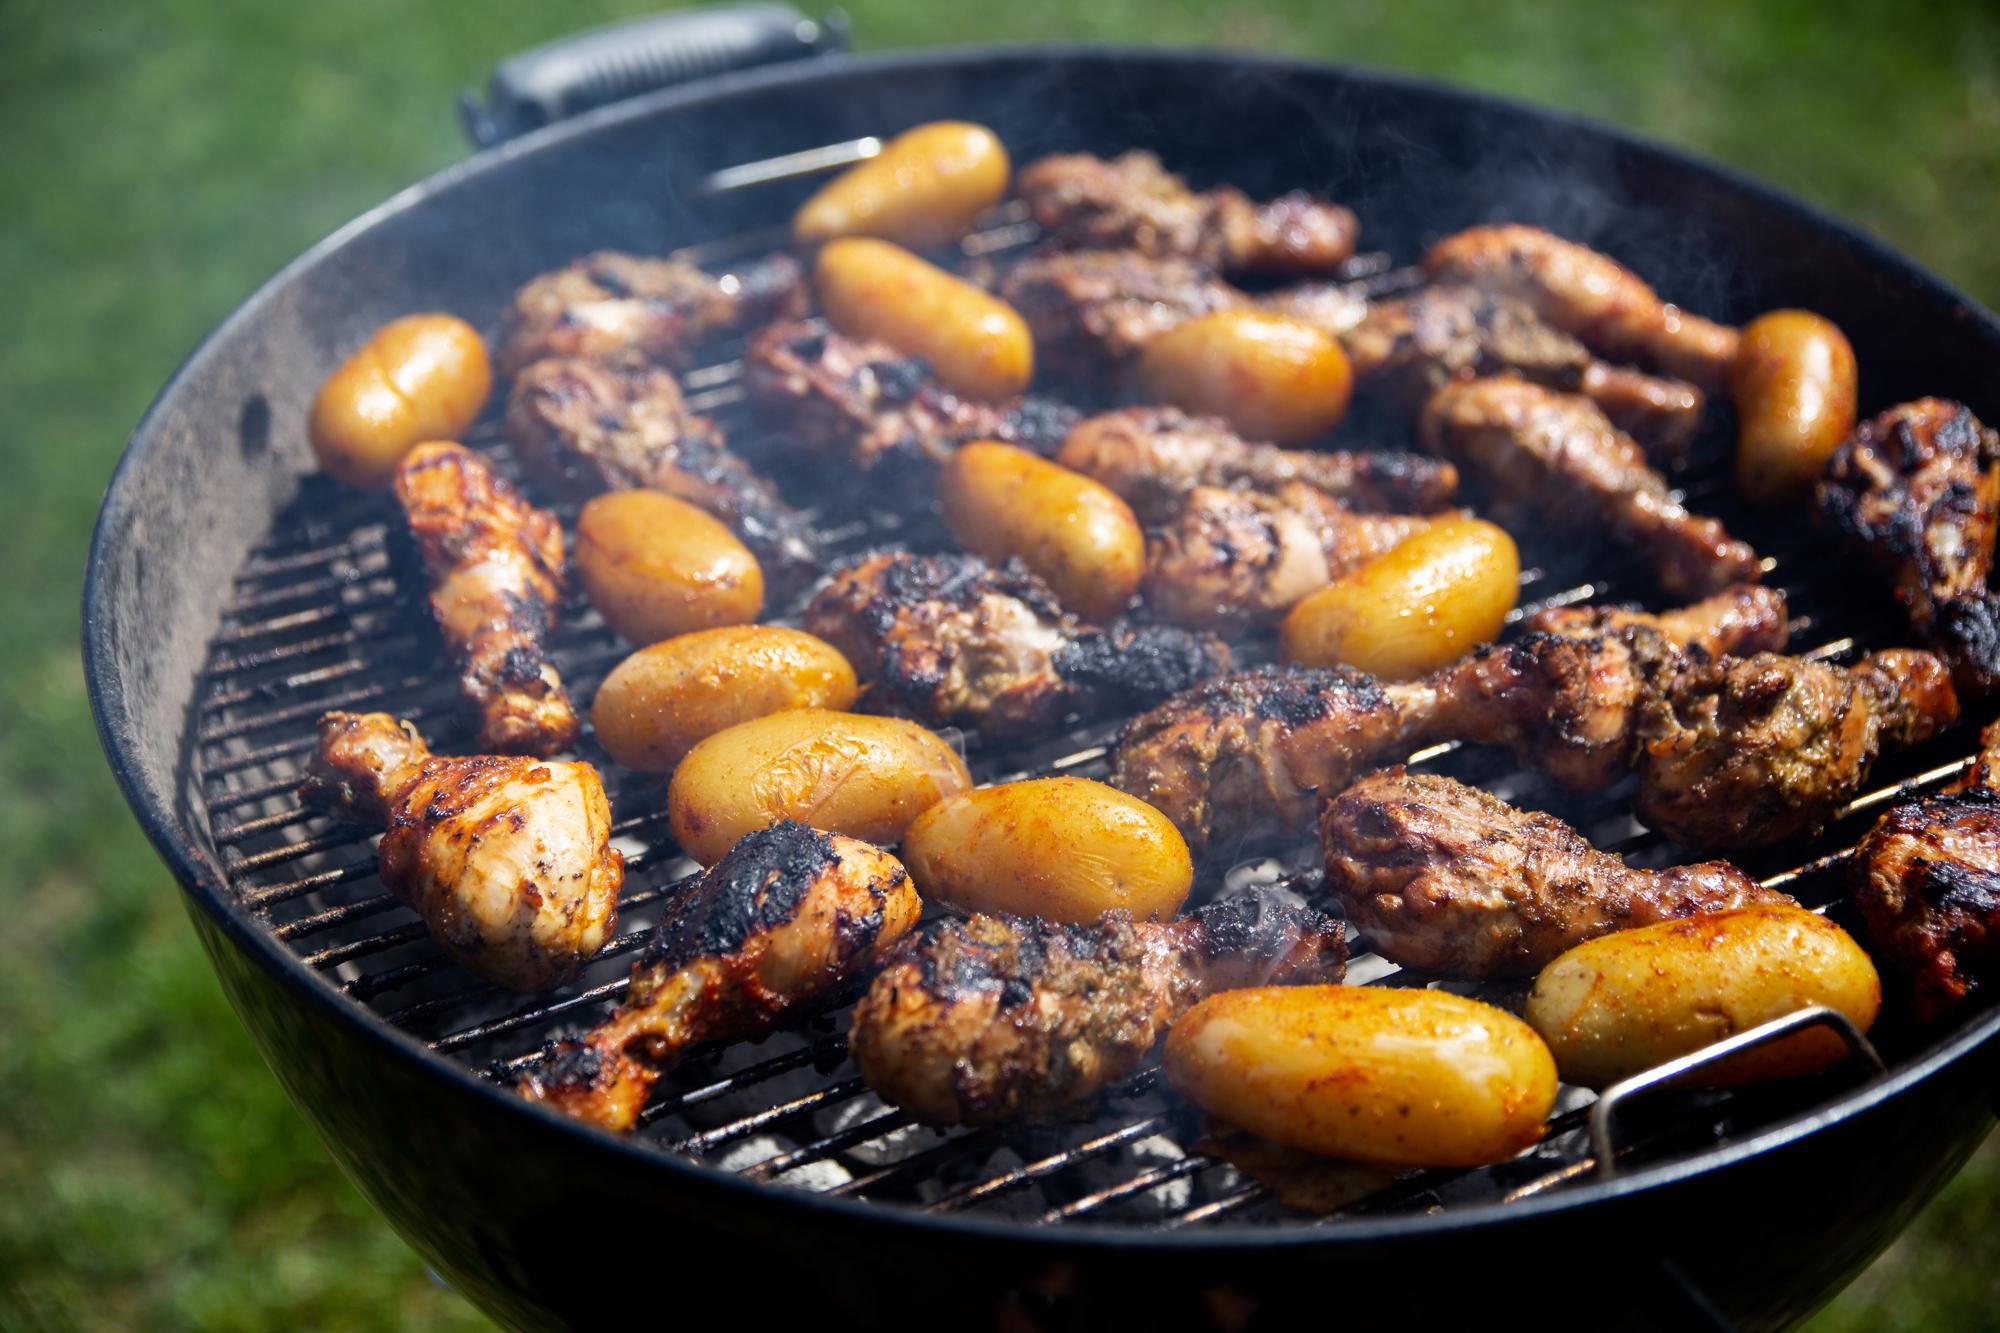 grillad potatis